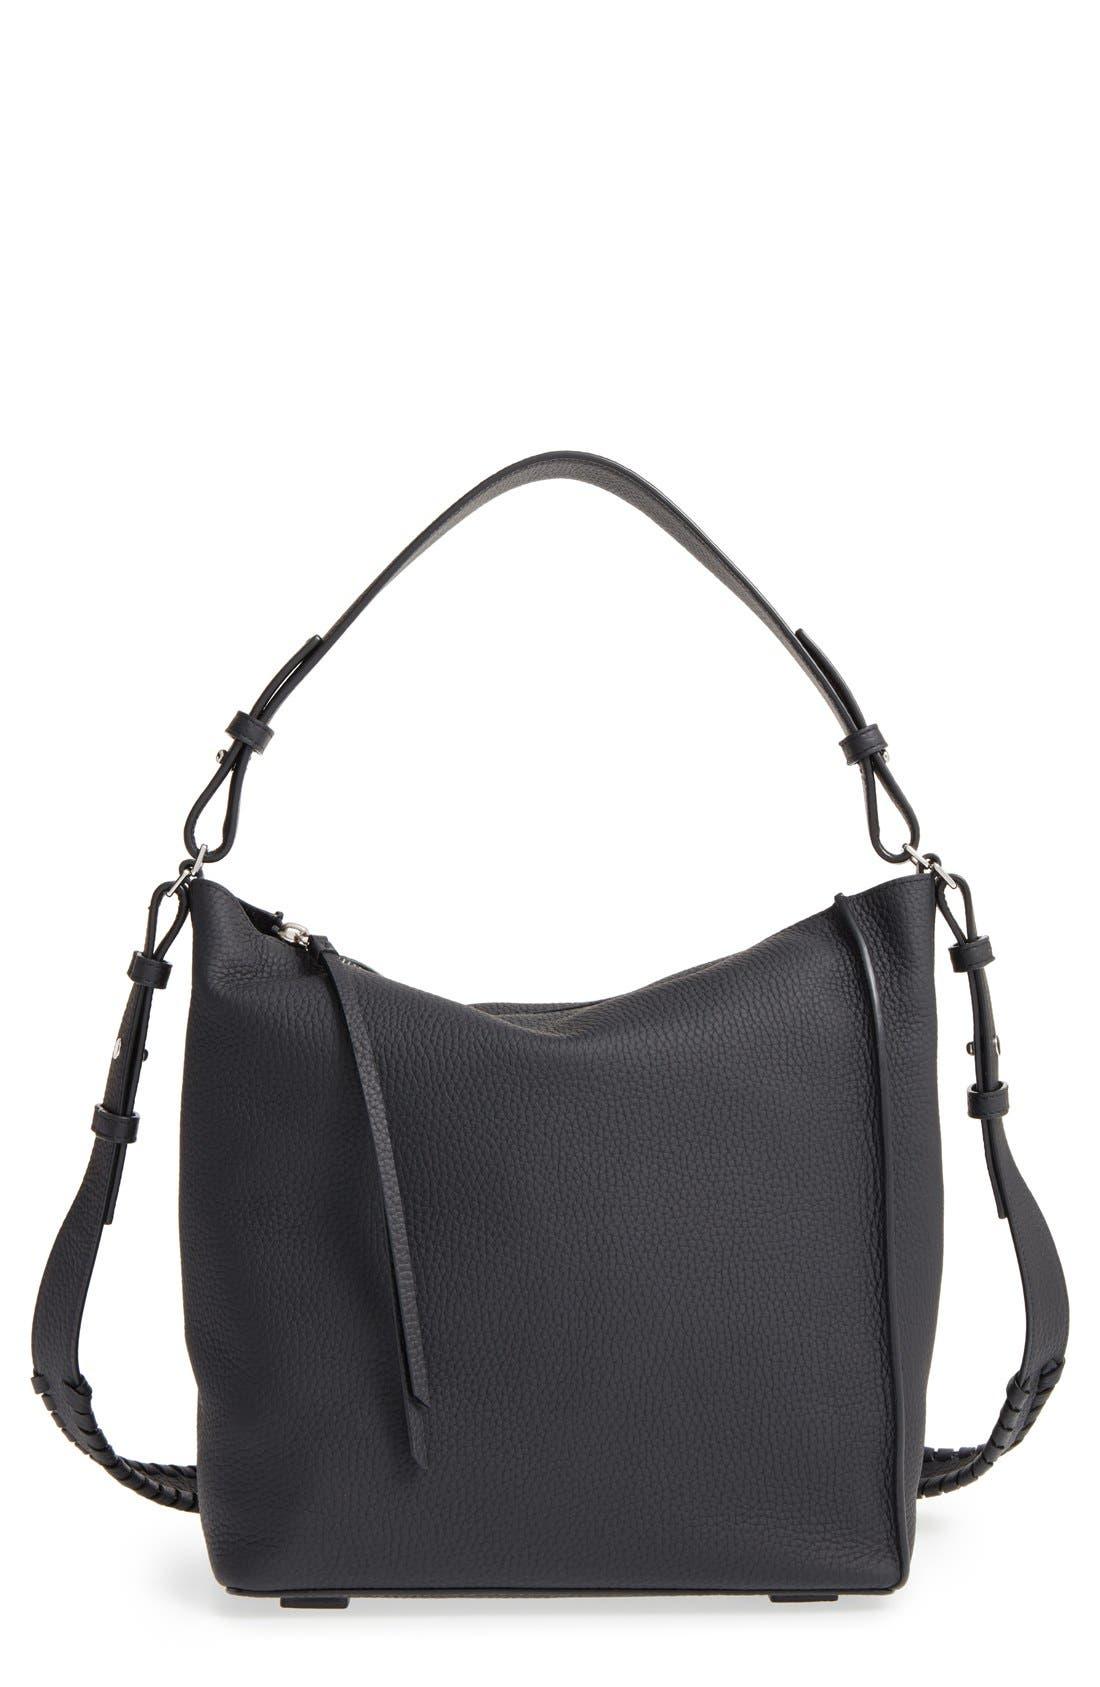 'Kita' Leather Shoulder/Crossbody Bag,                             Main thumbnail 1, color,                             BLACK